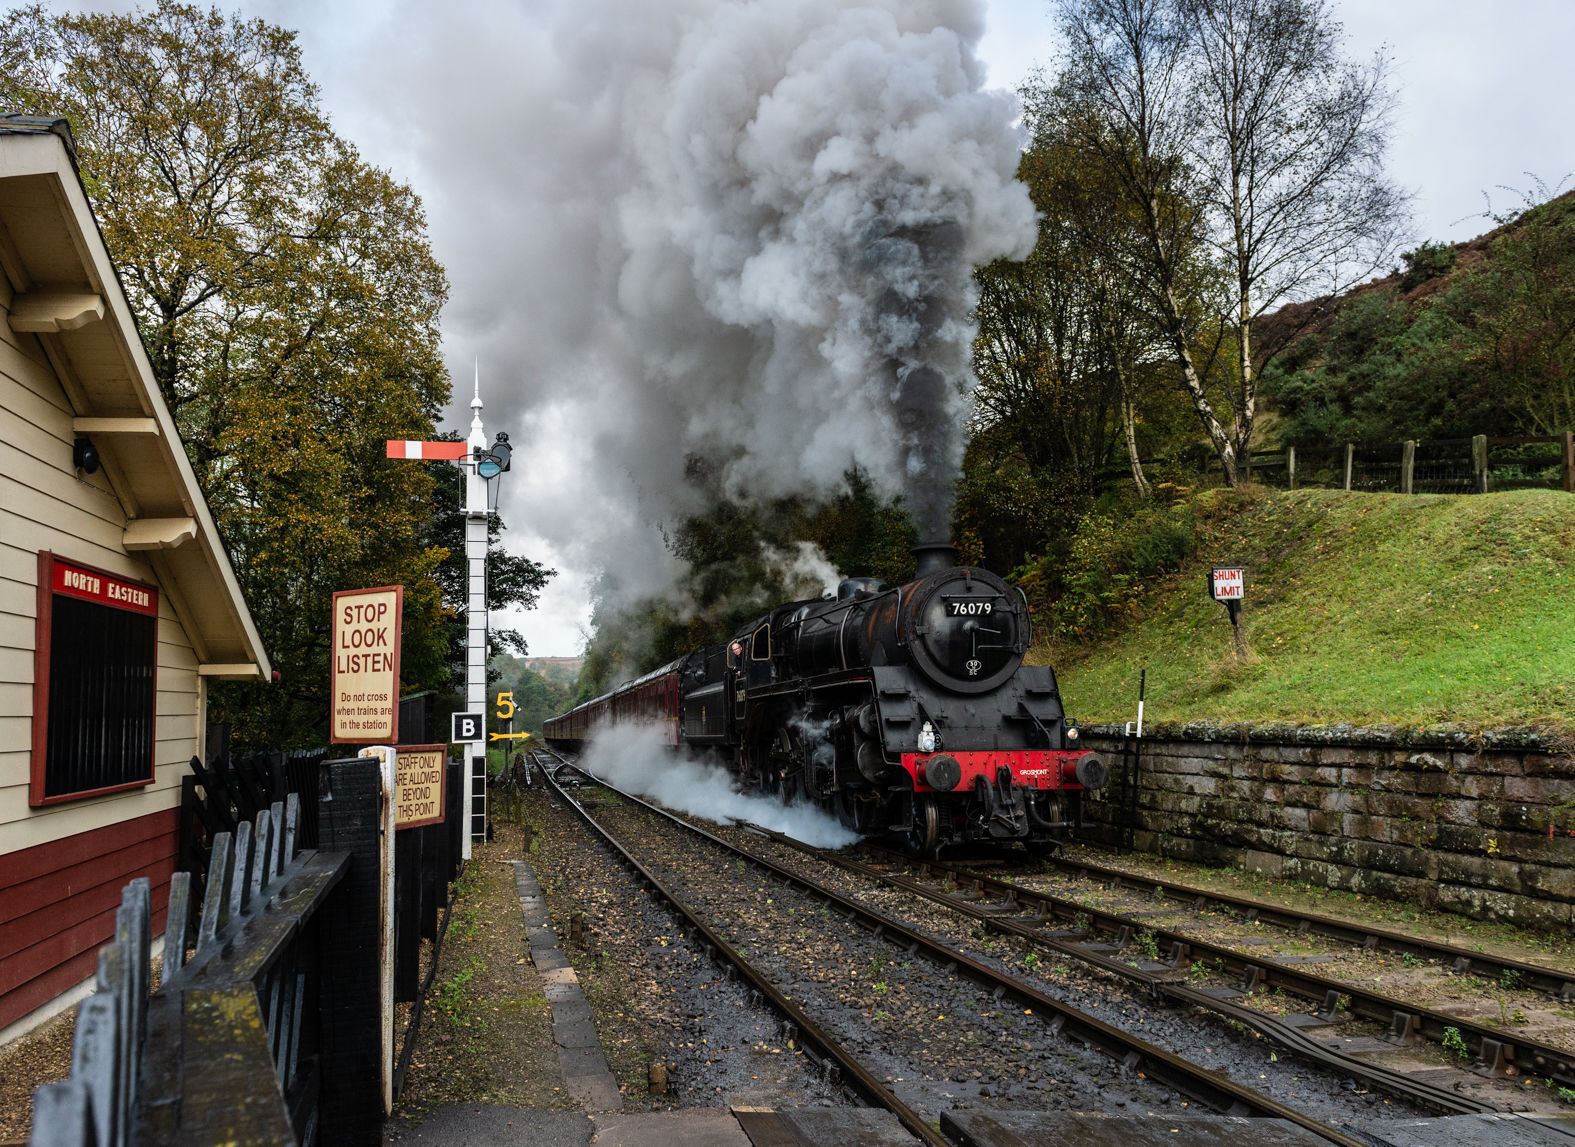 76079 climbing into Goathland, North Yorkshire